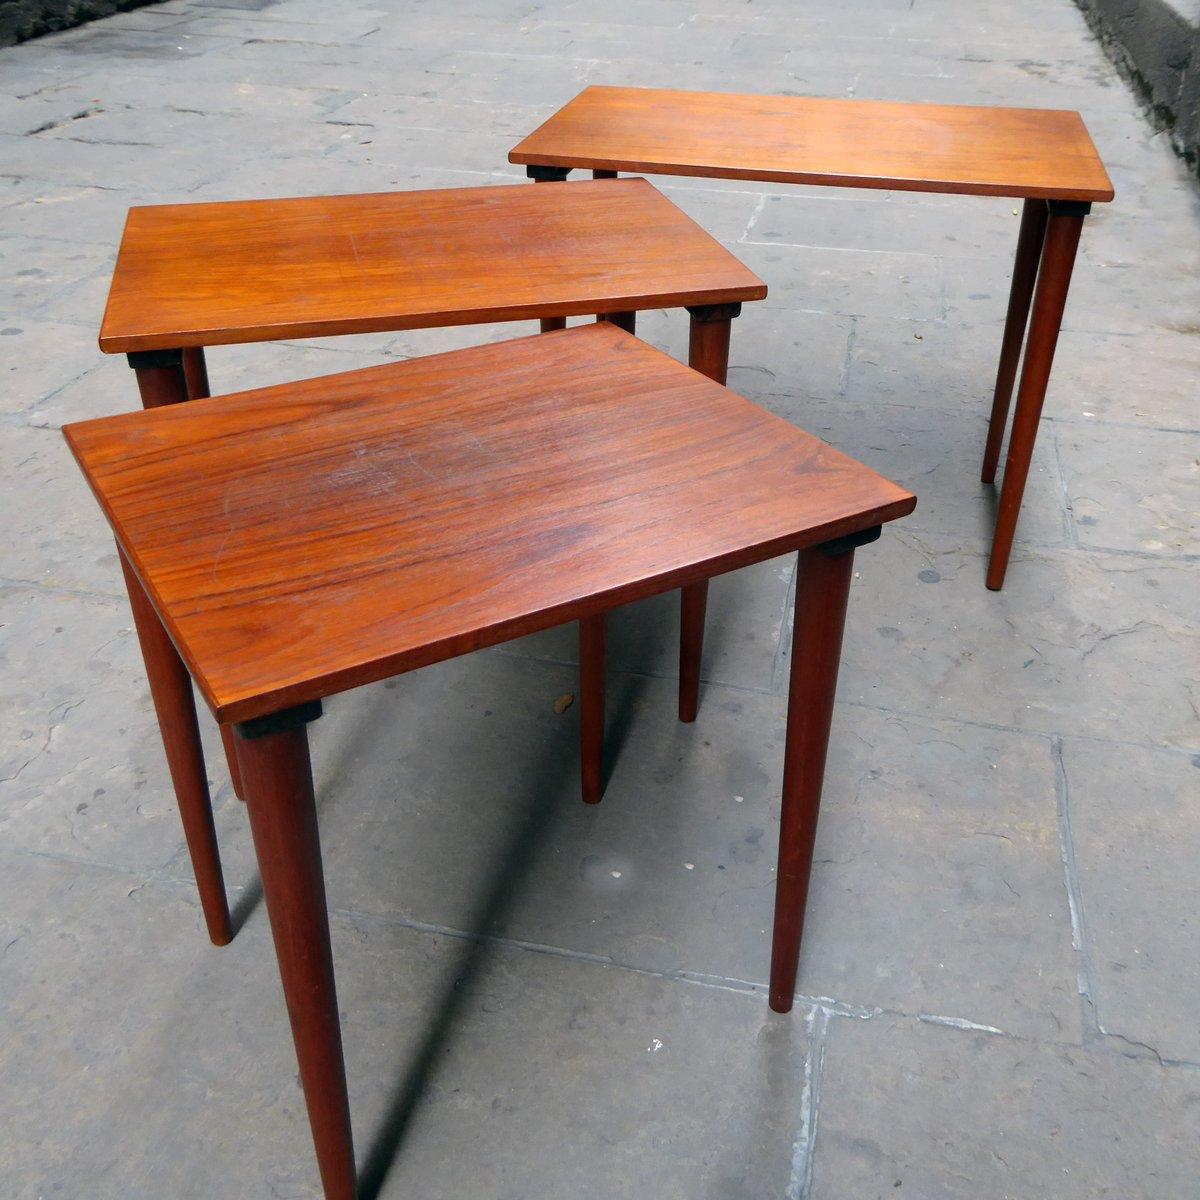 High Quality Mid Century Danish Teak Nesting Tables, Set Of 3